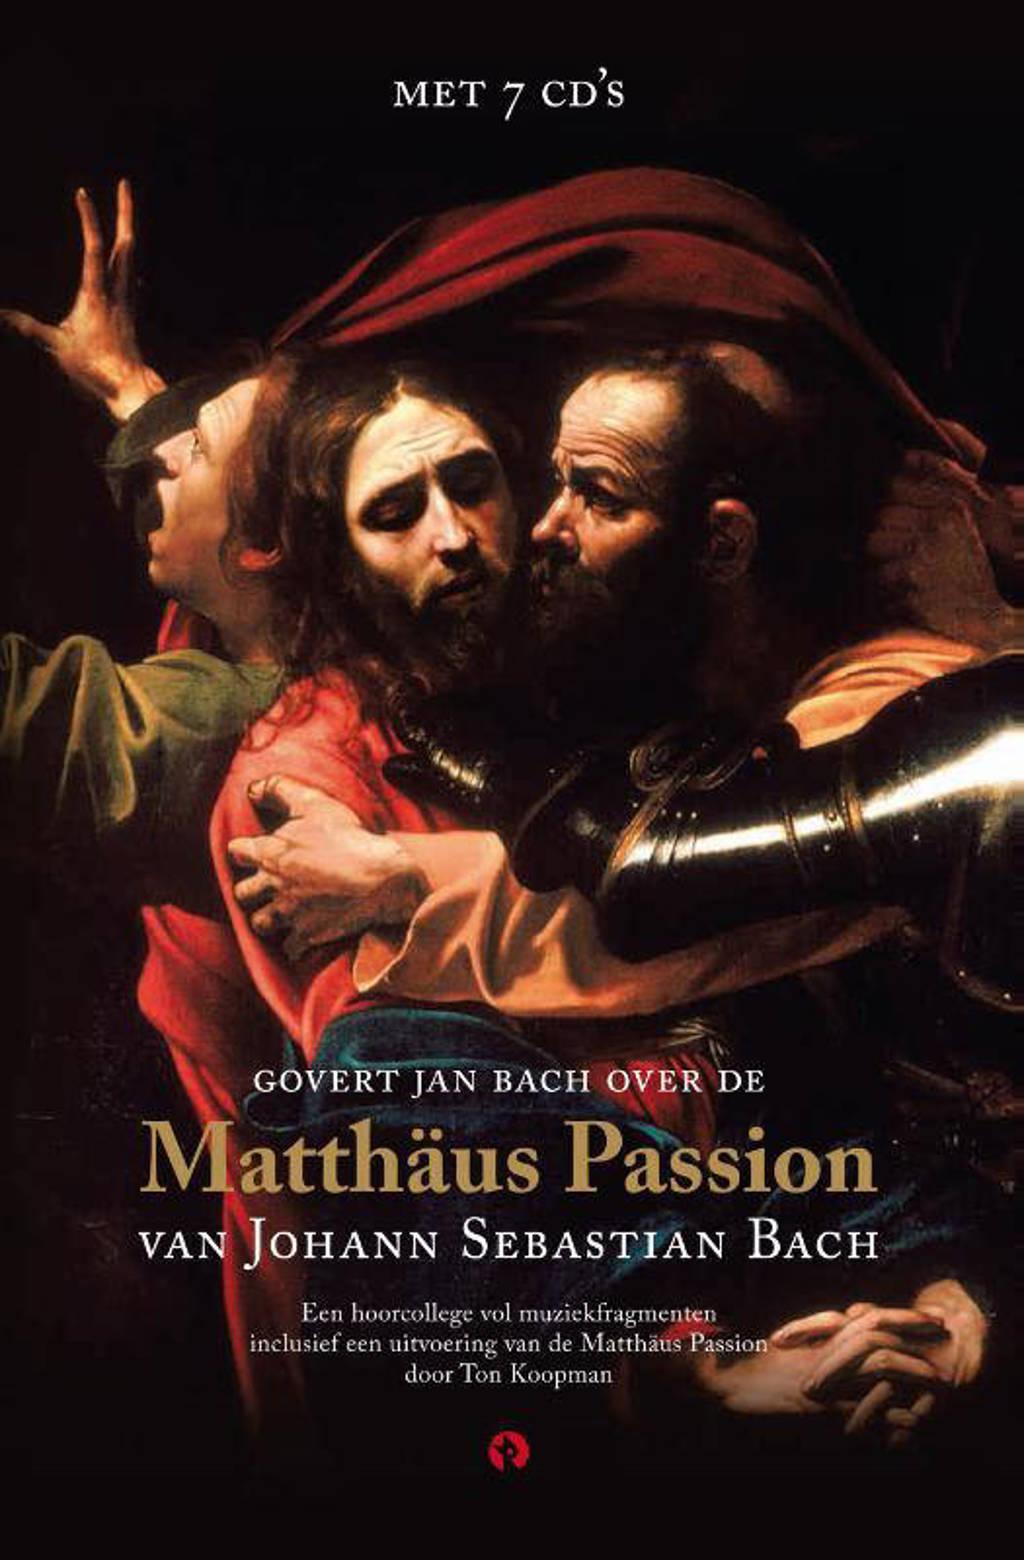 Matthäus Passion - Govert Jan Bach